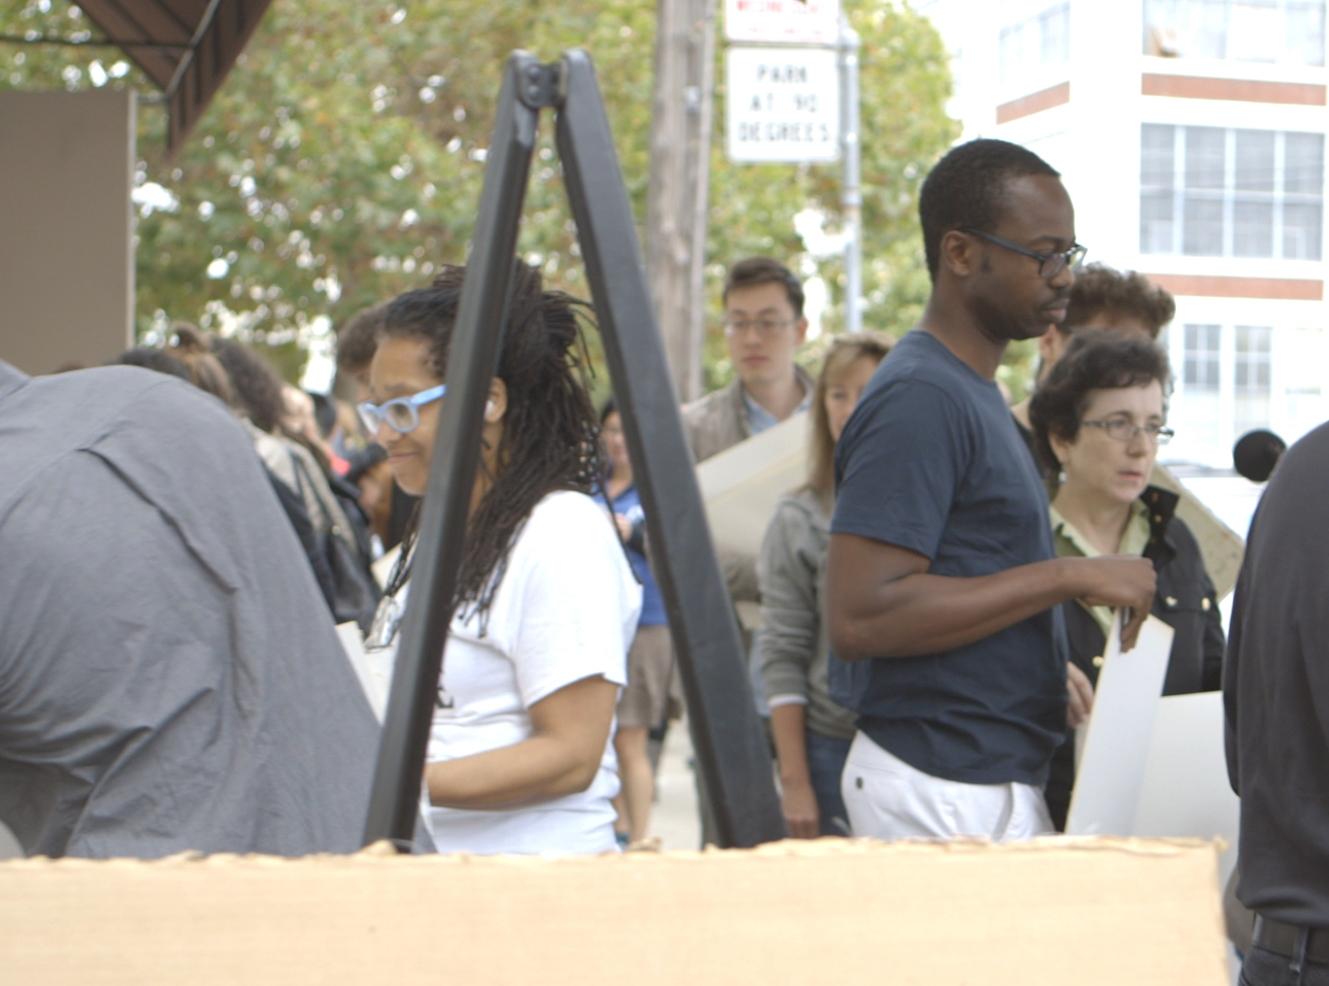 PAMELA Z in the crowd.